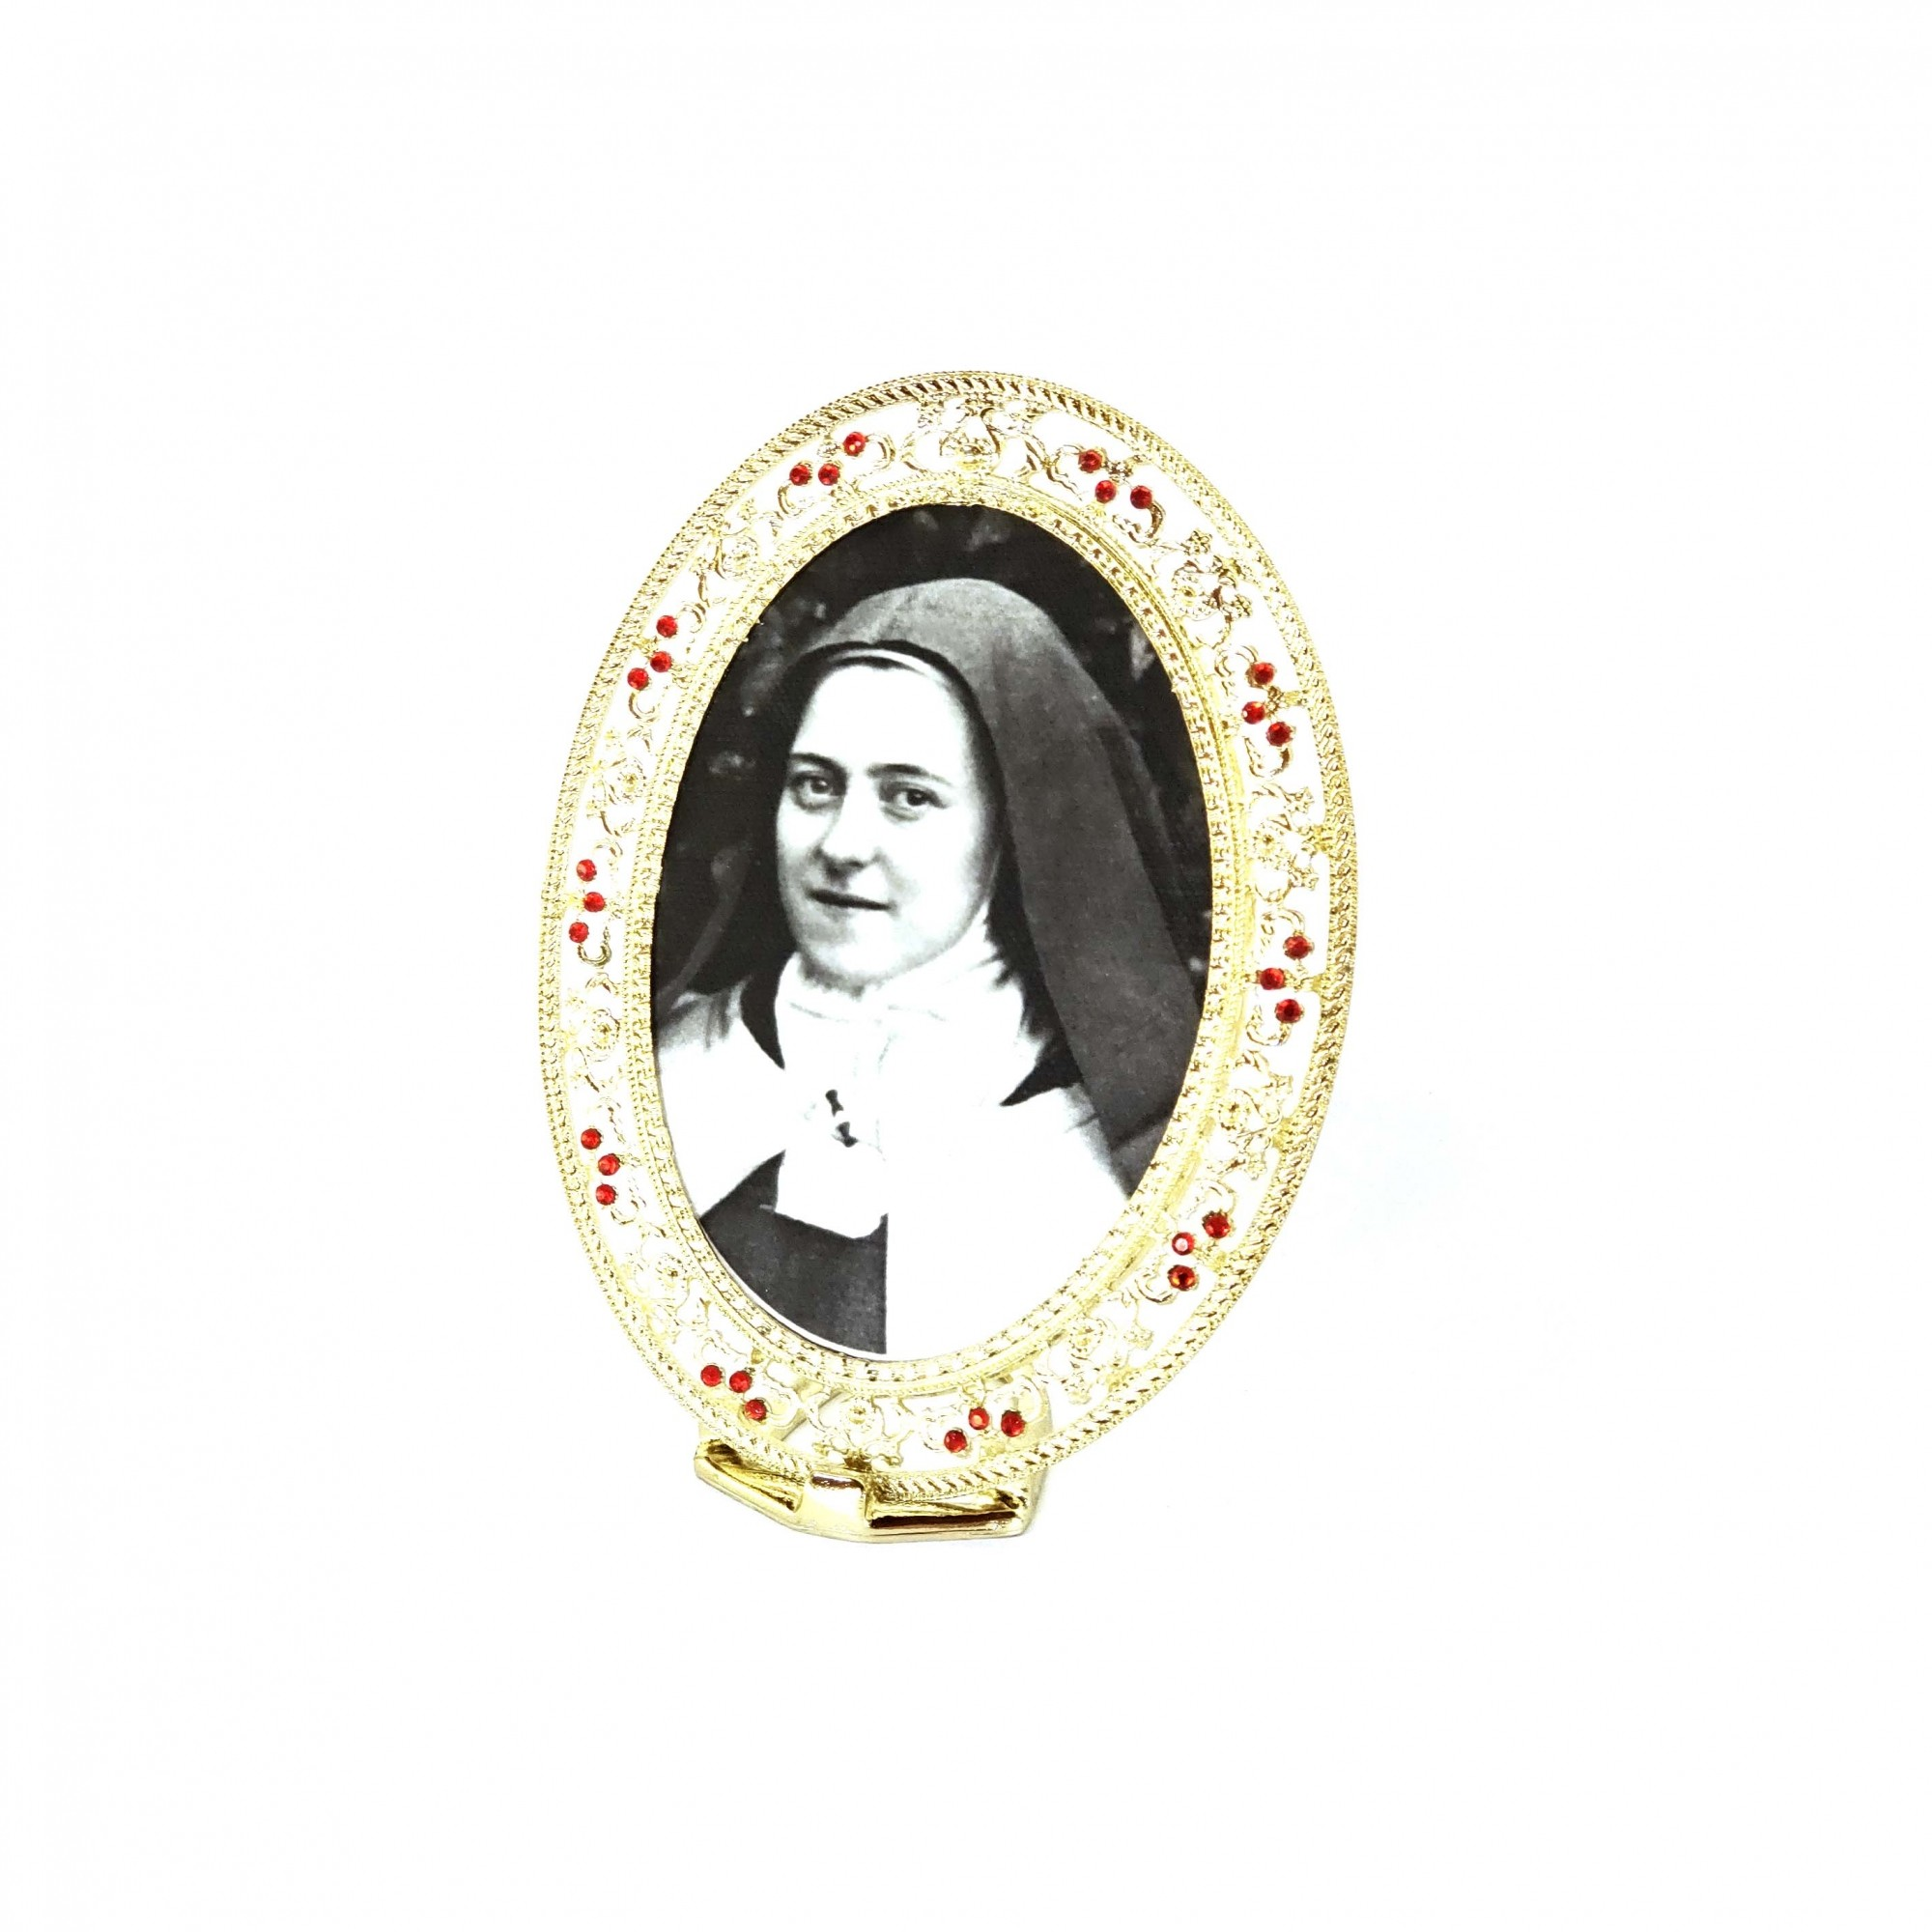 Adorno de mesa Oval Camafeu Santa Teresinha do Menino Jesus